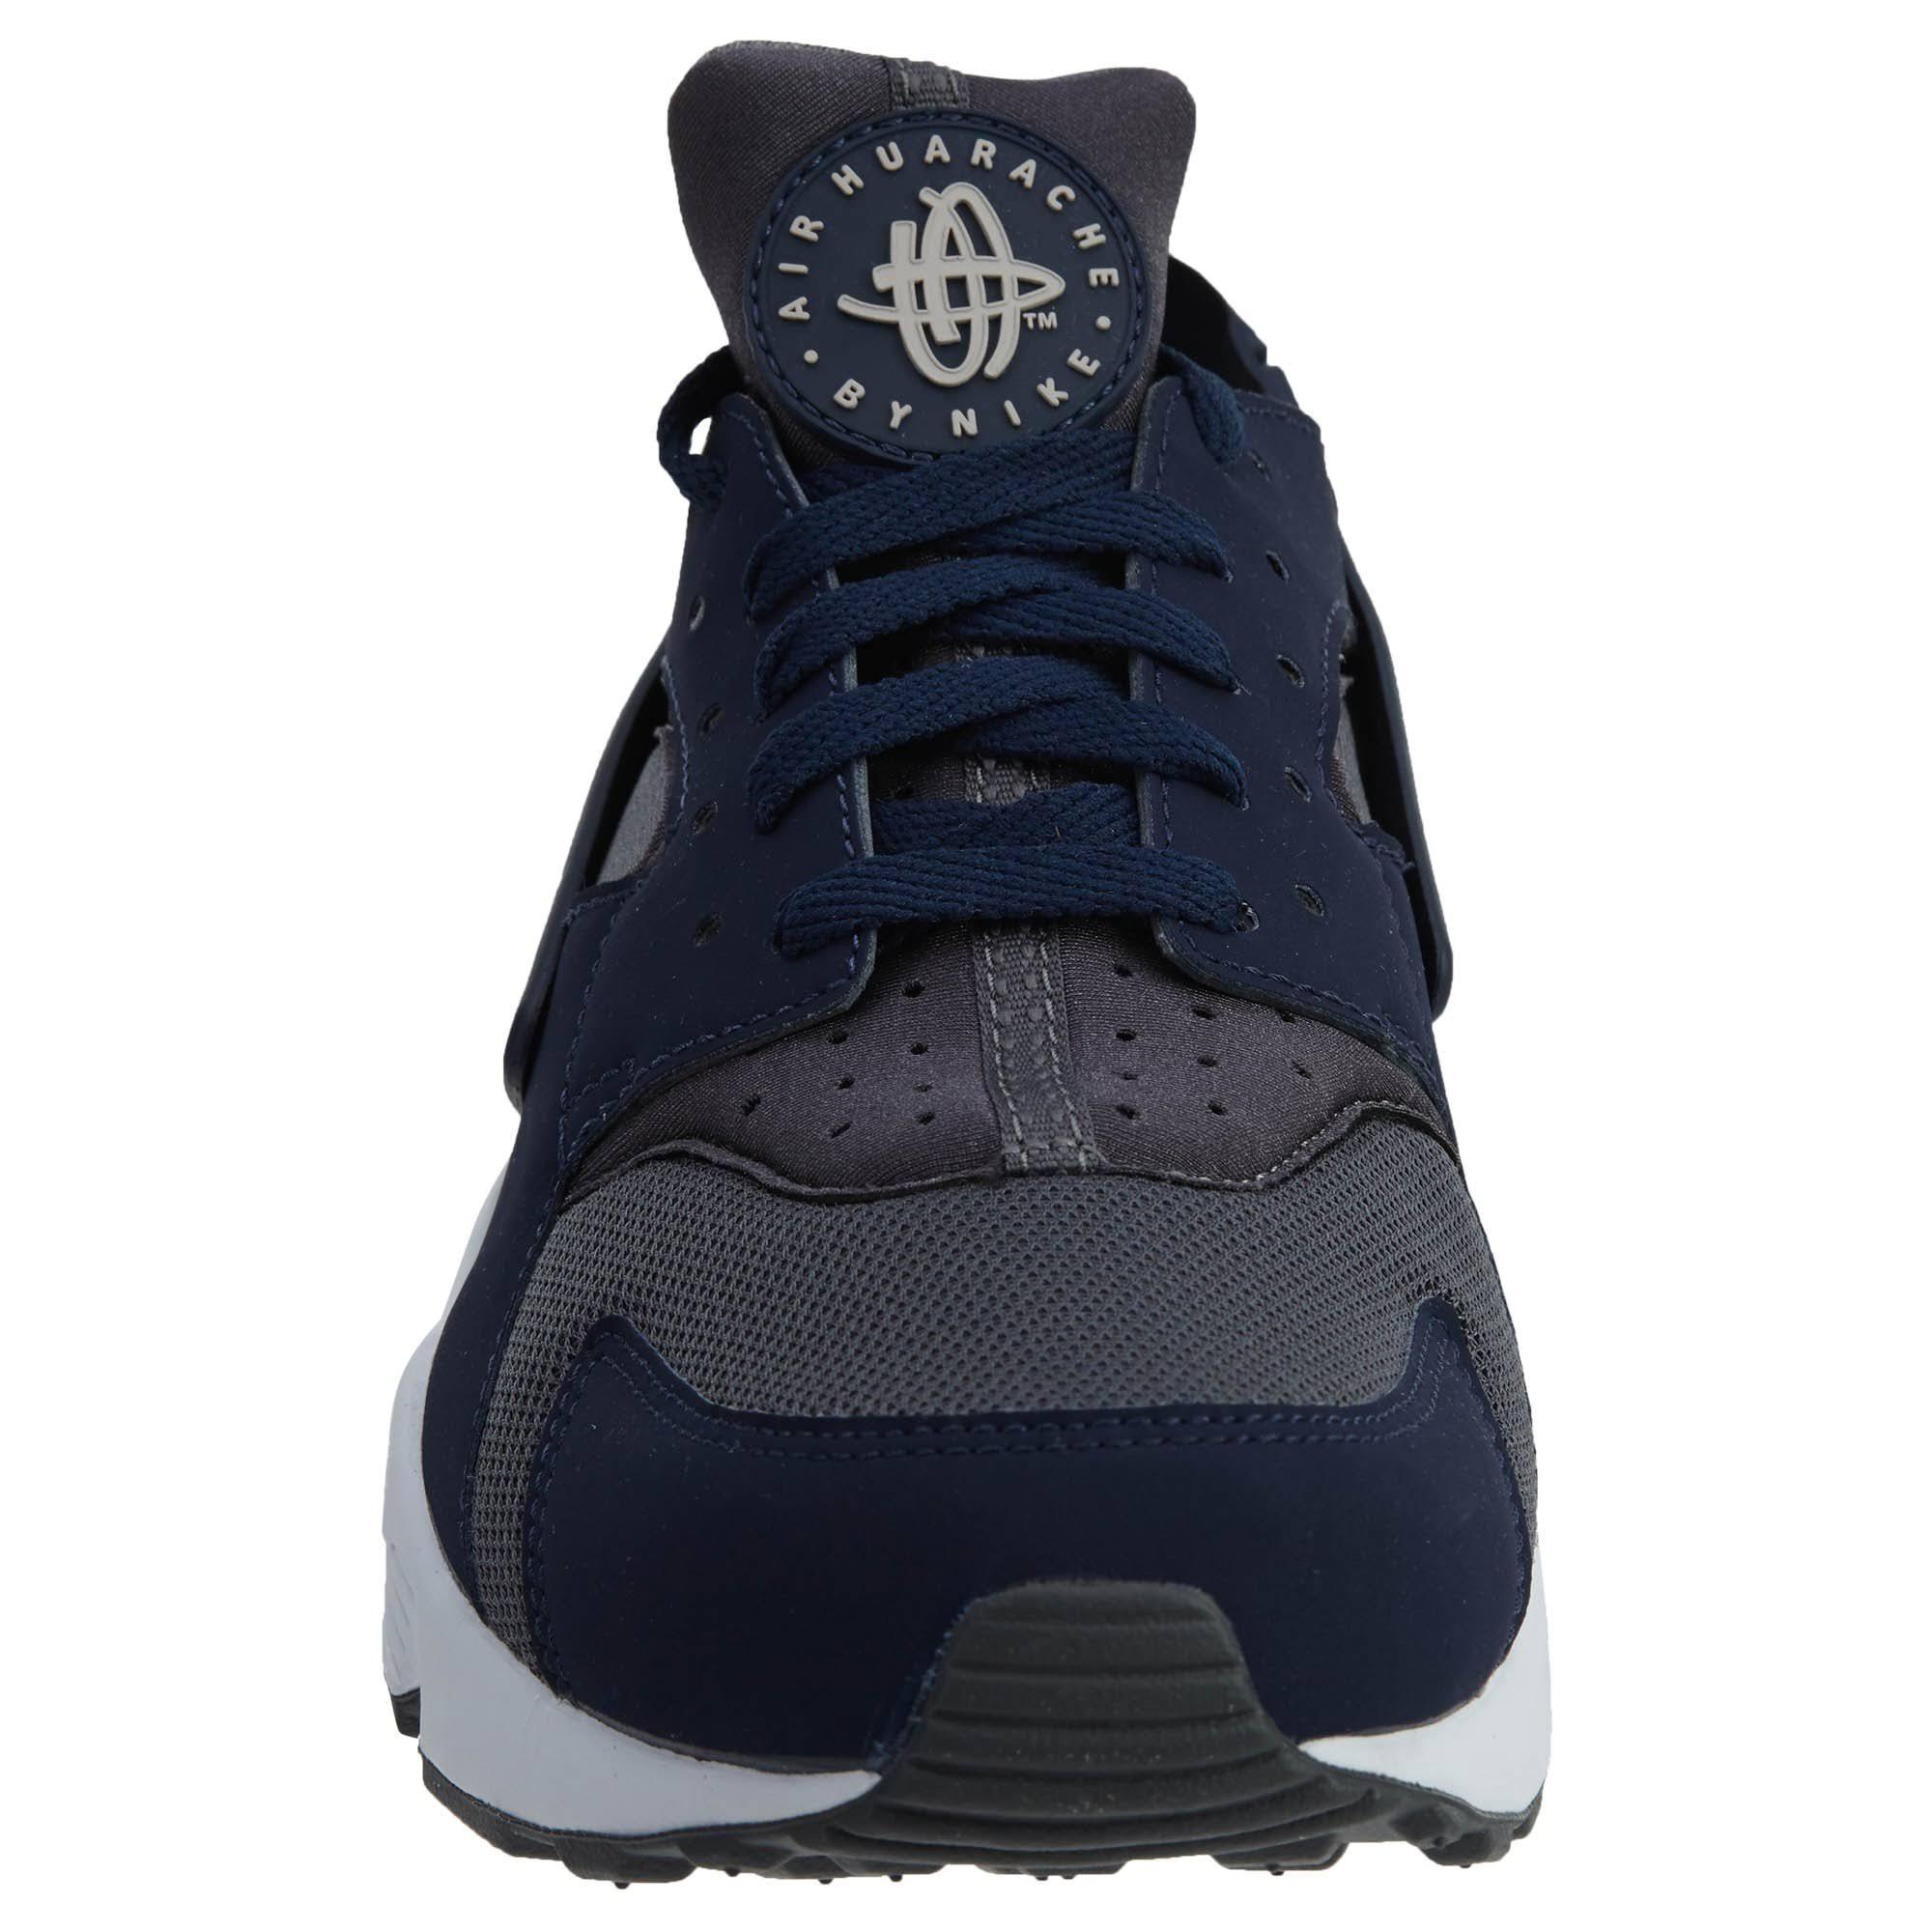 Air Nike Azul Gris Marino Huarache Oscuro Medianoche Hombres Zq4fz4wd